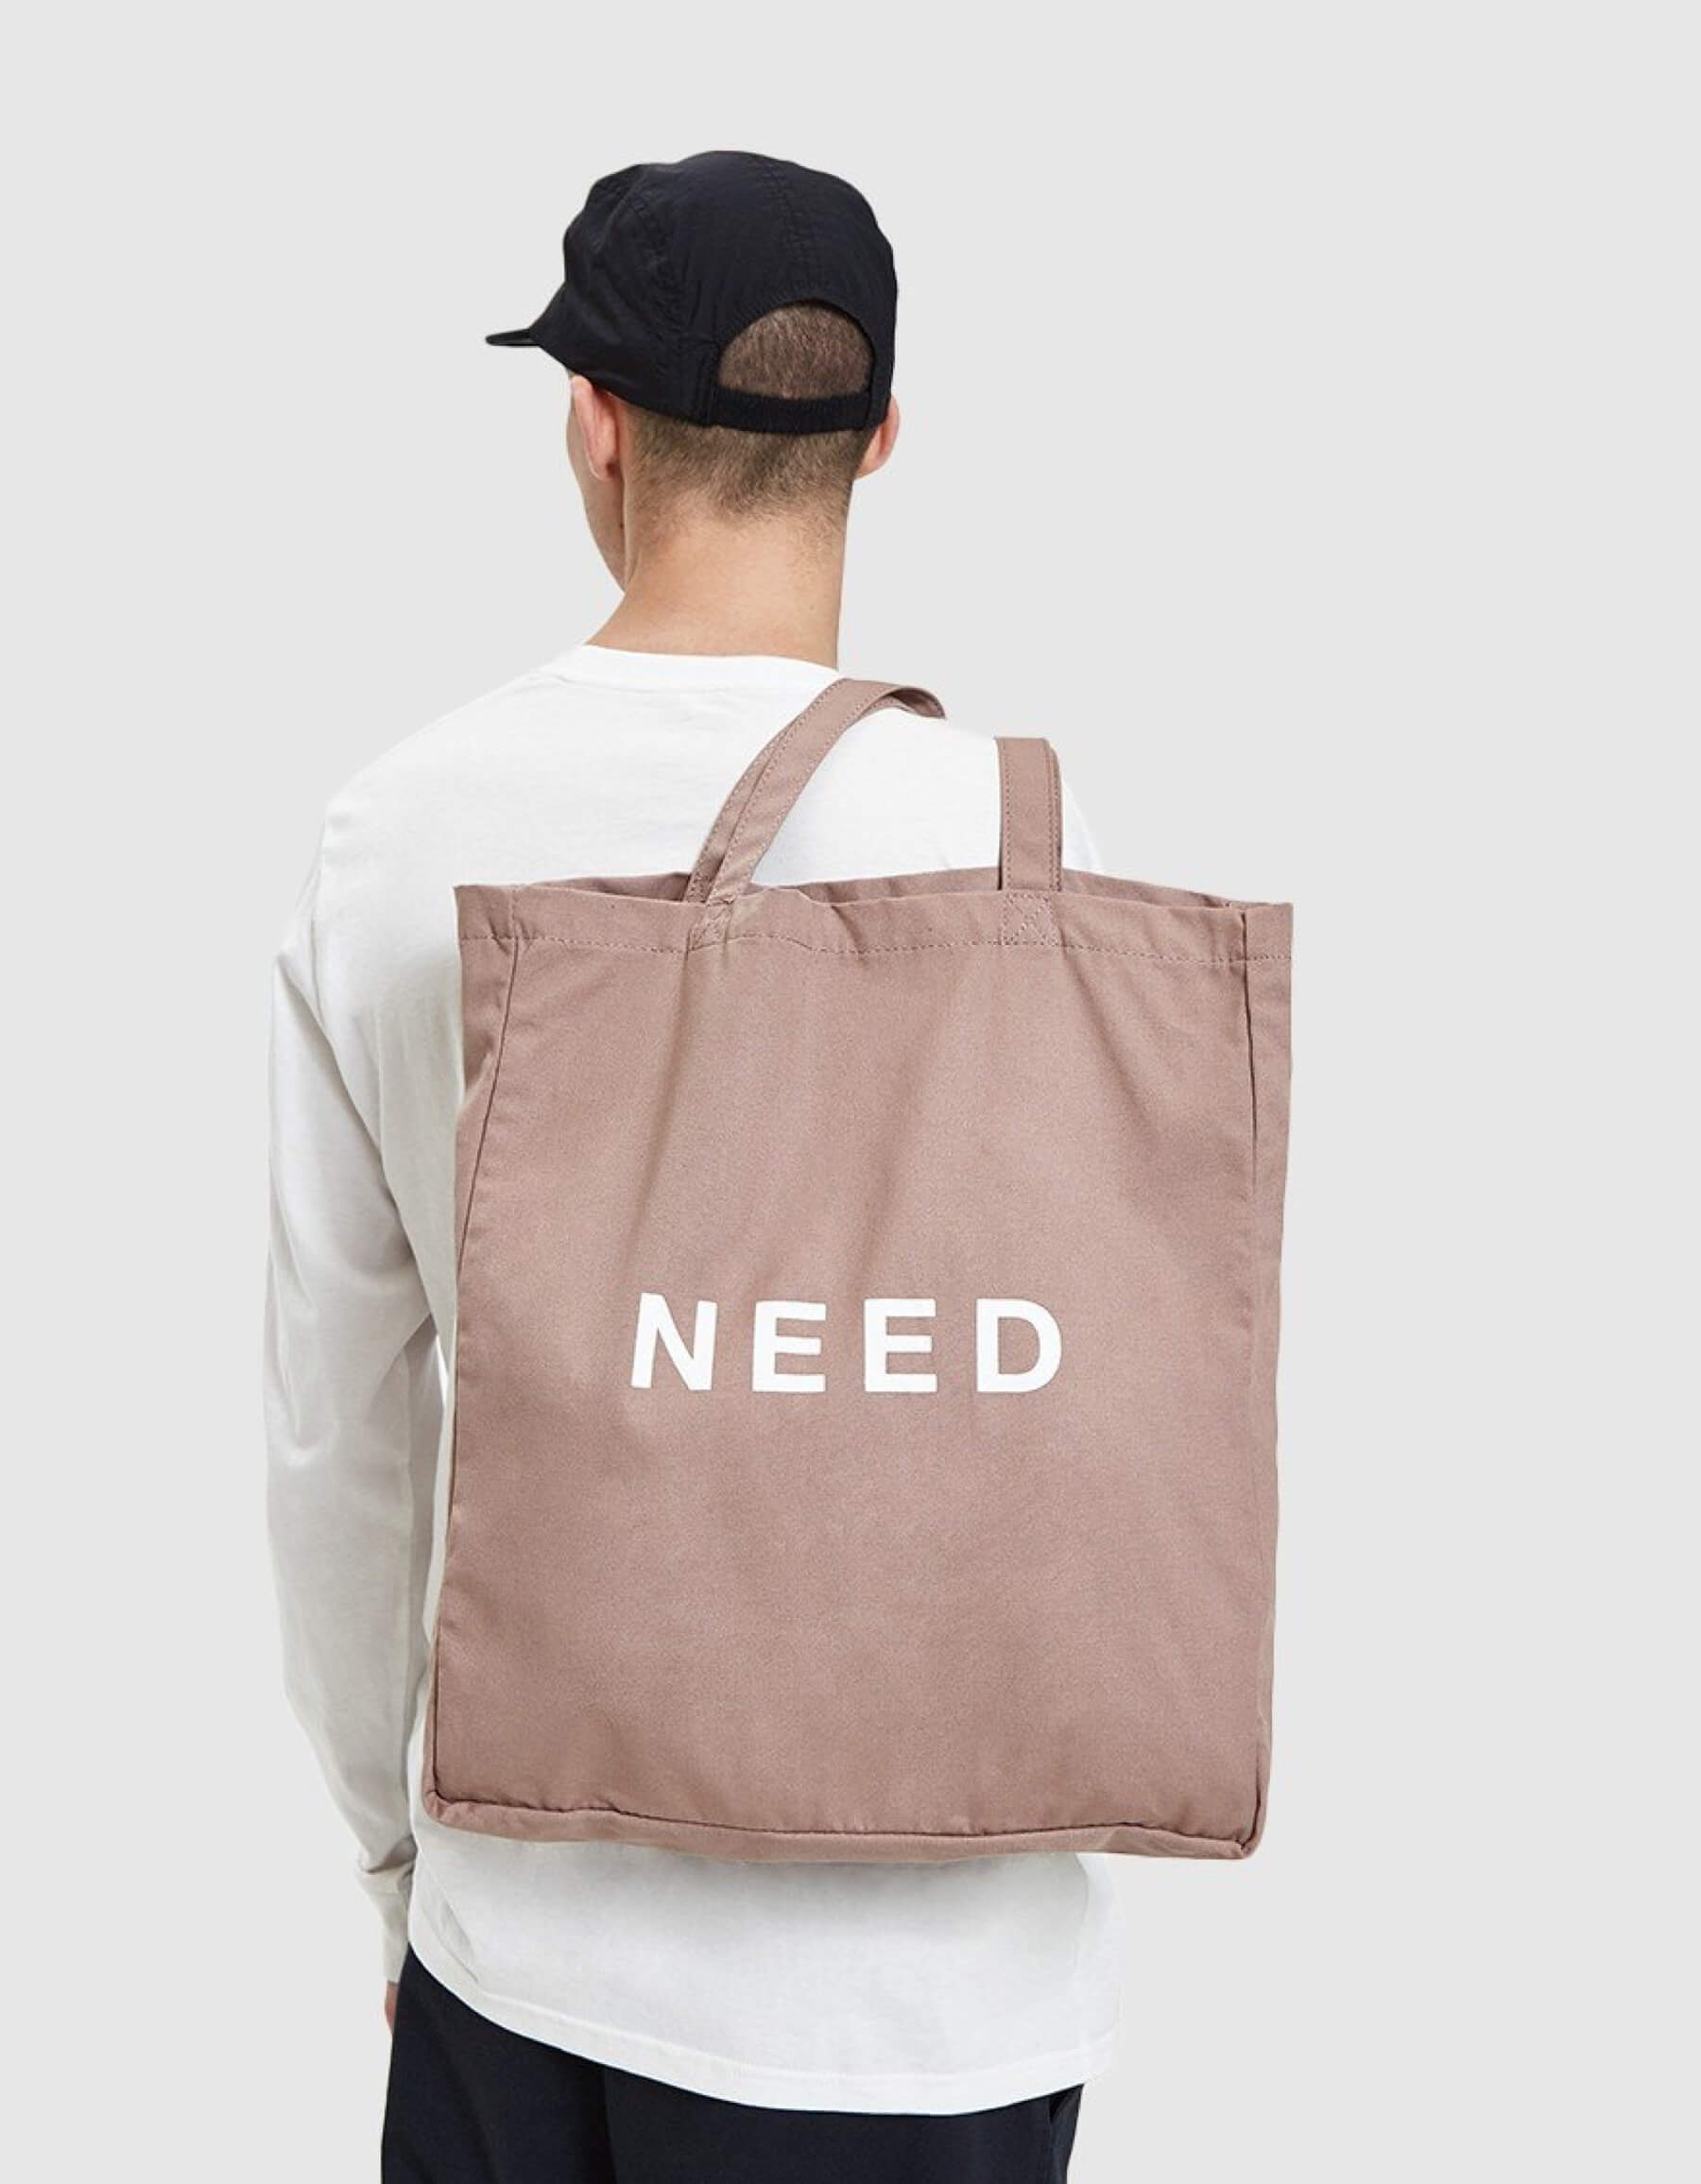 The best men's bags for summer